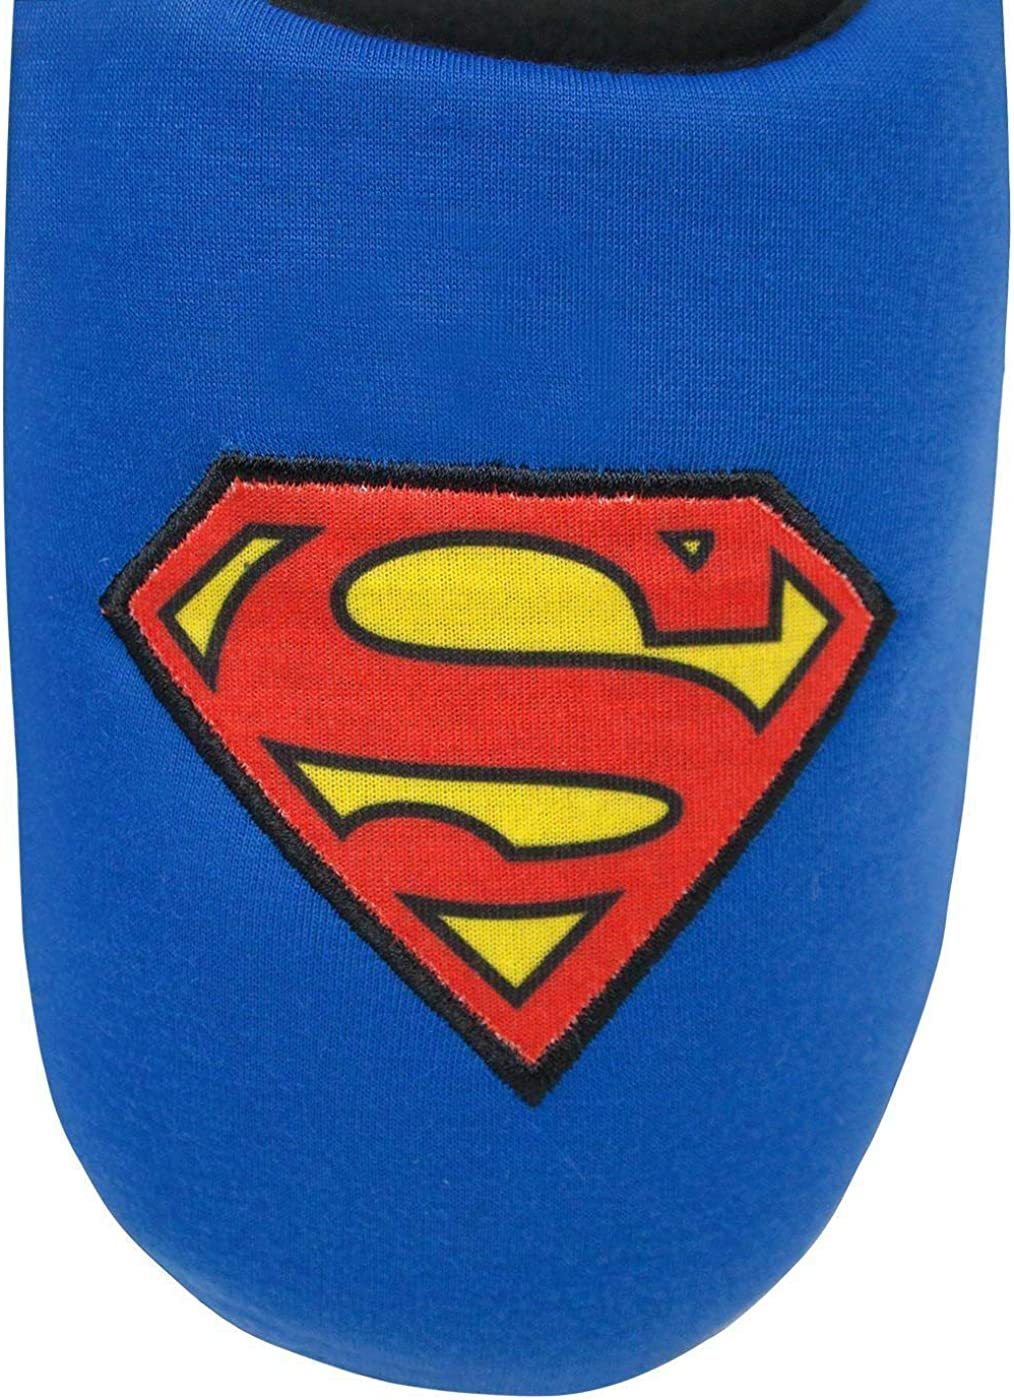 Superman DC Comics Men's Blue Slippers